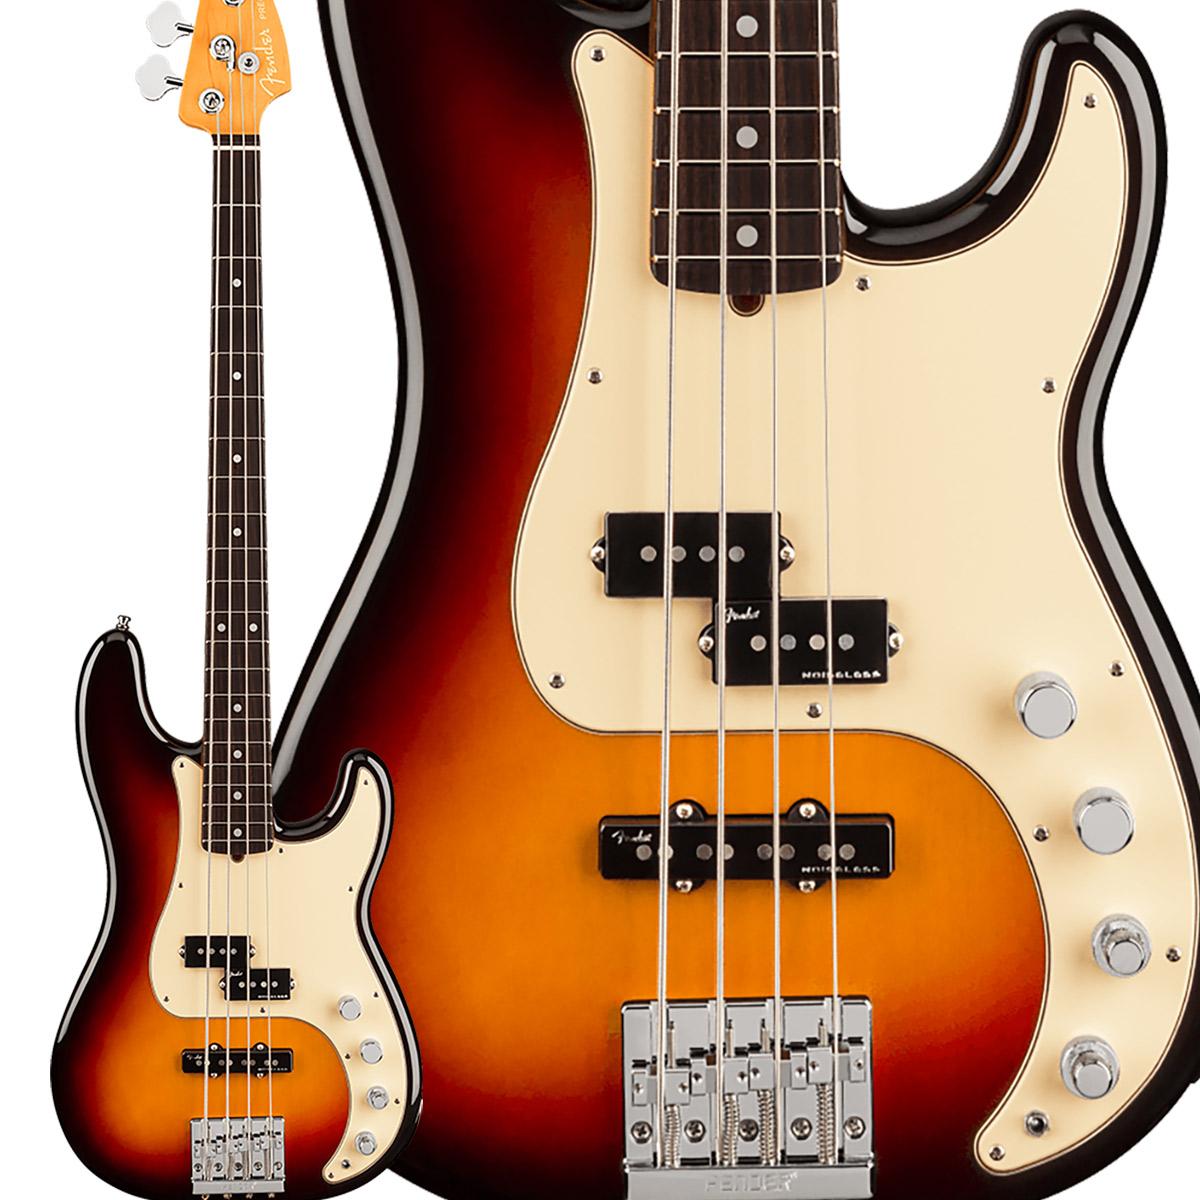 Fender American Ultra Precision Bass Rosewood Fingerboard Ultraburst プレシジョンベース 【フェンダー】